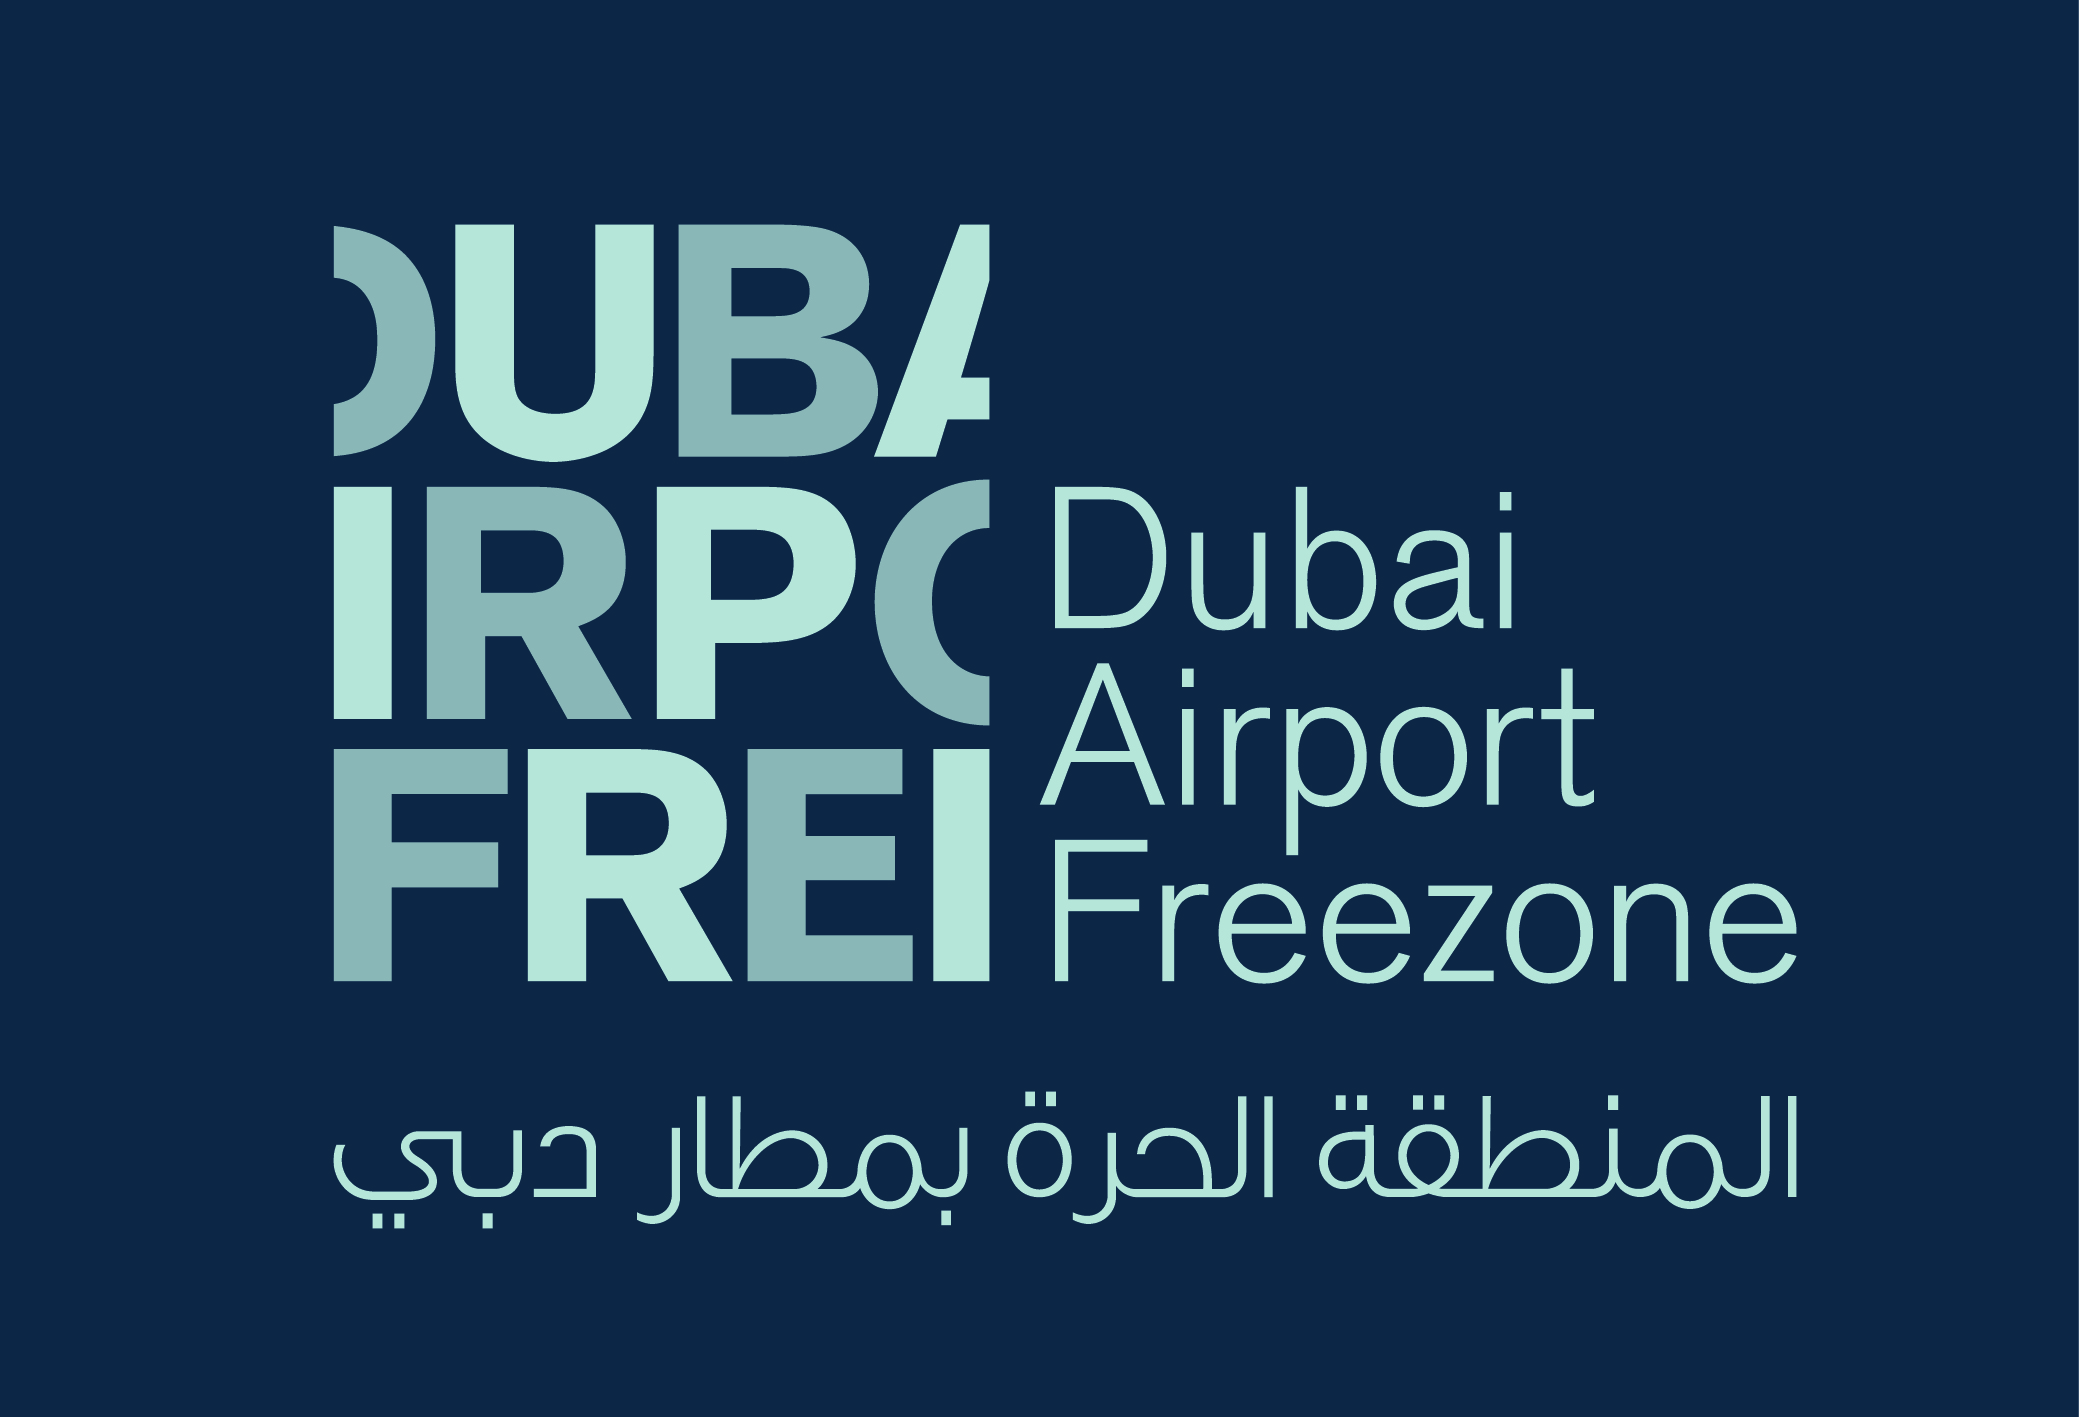 Dubai-Airport-Free-Zone-Companies-Directory